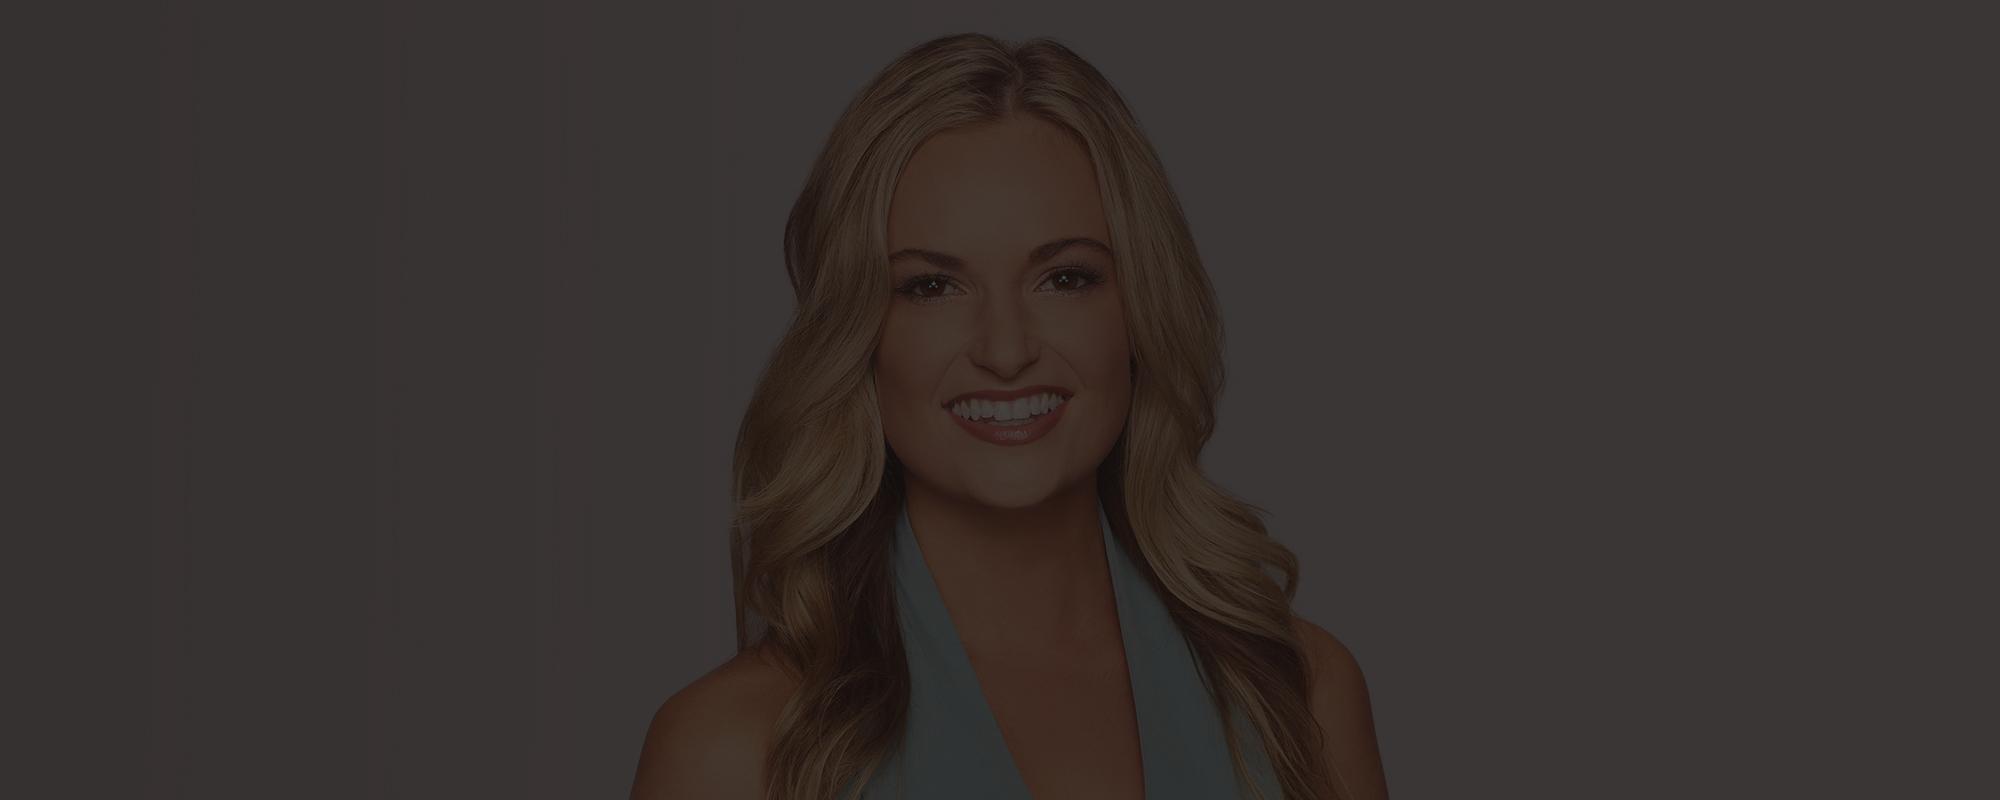 ANNIE  23 | New York, New York | Financial Associate